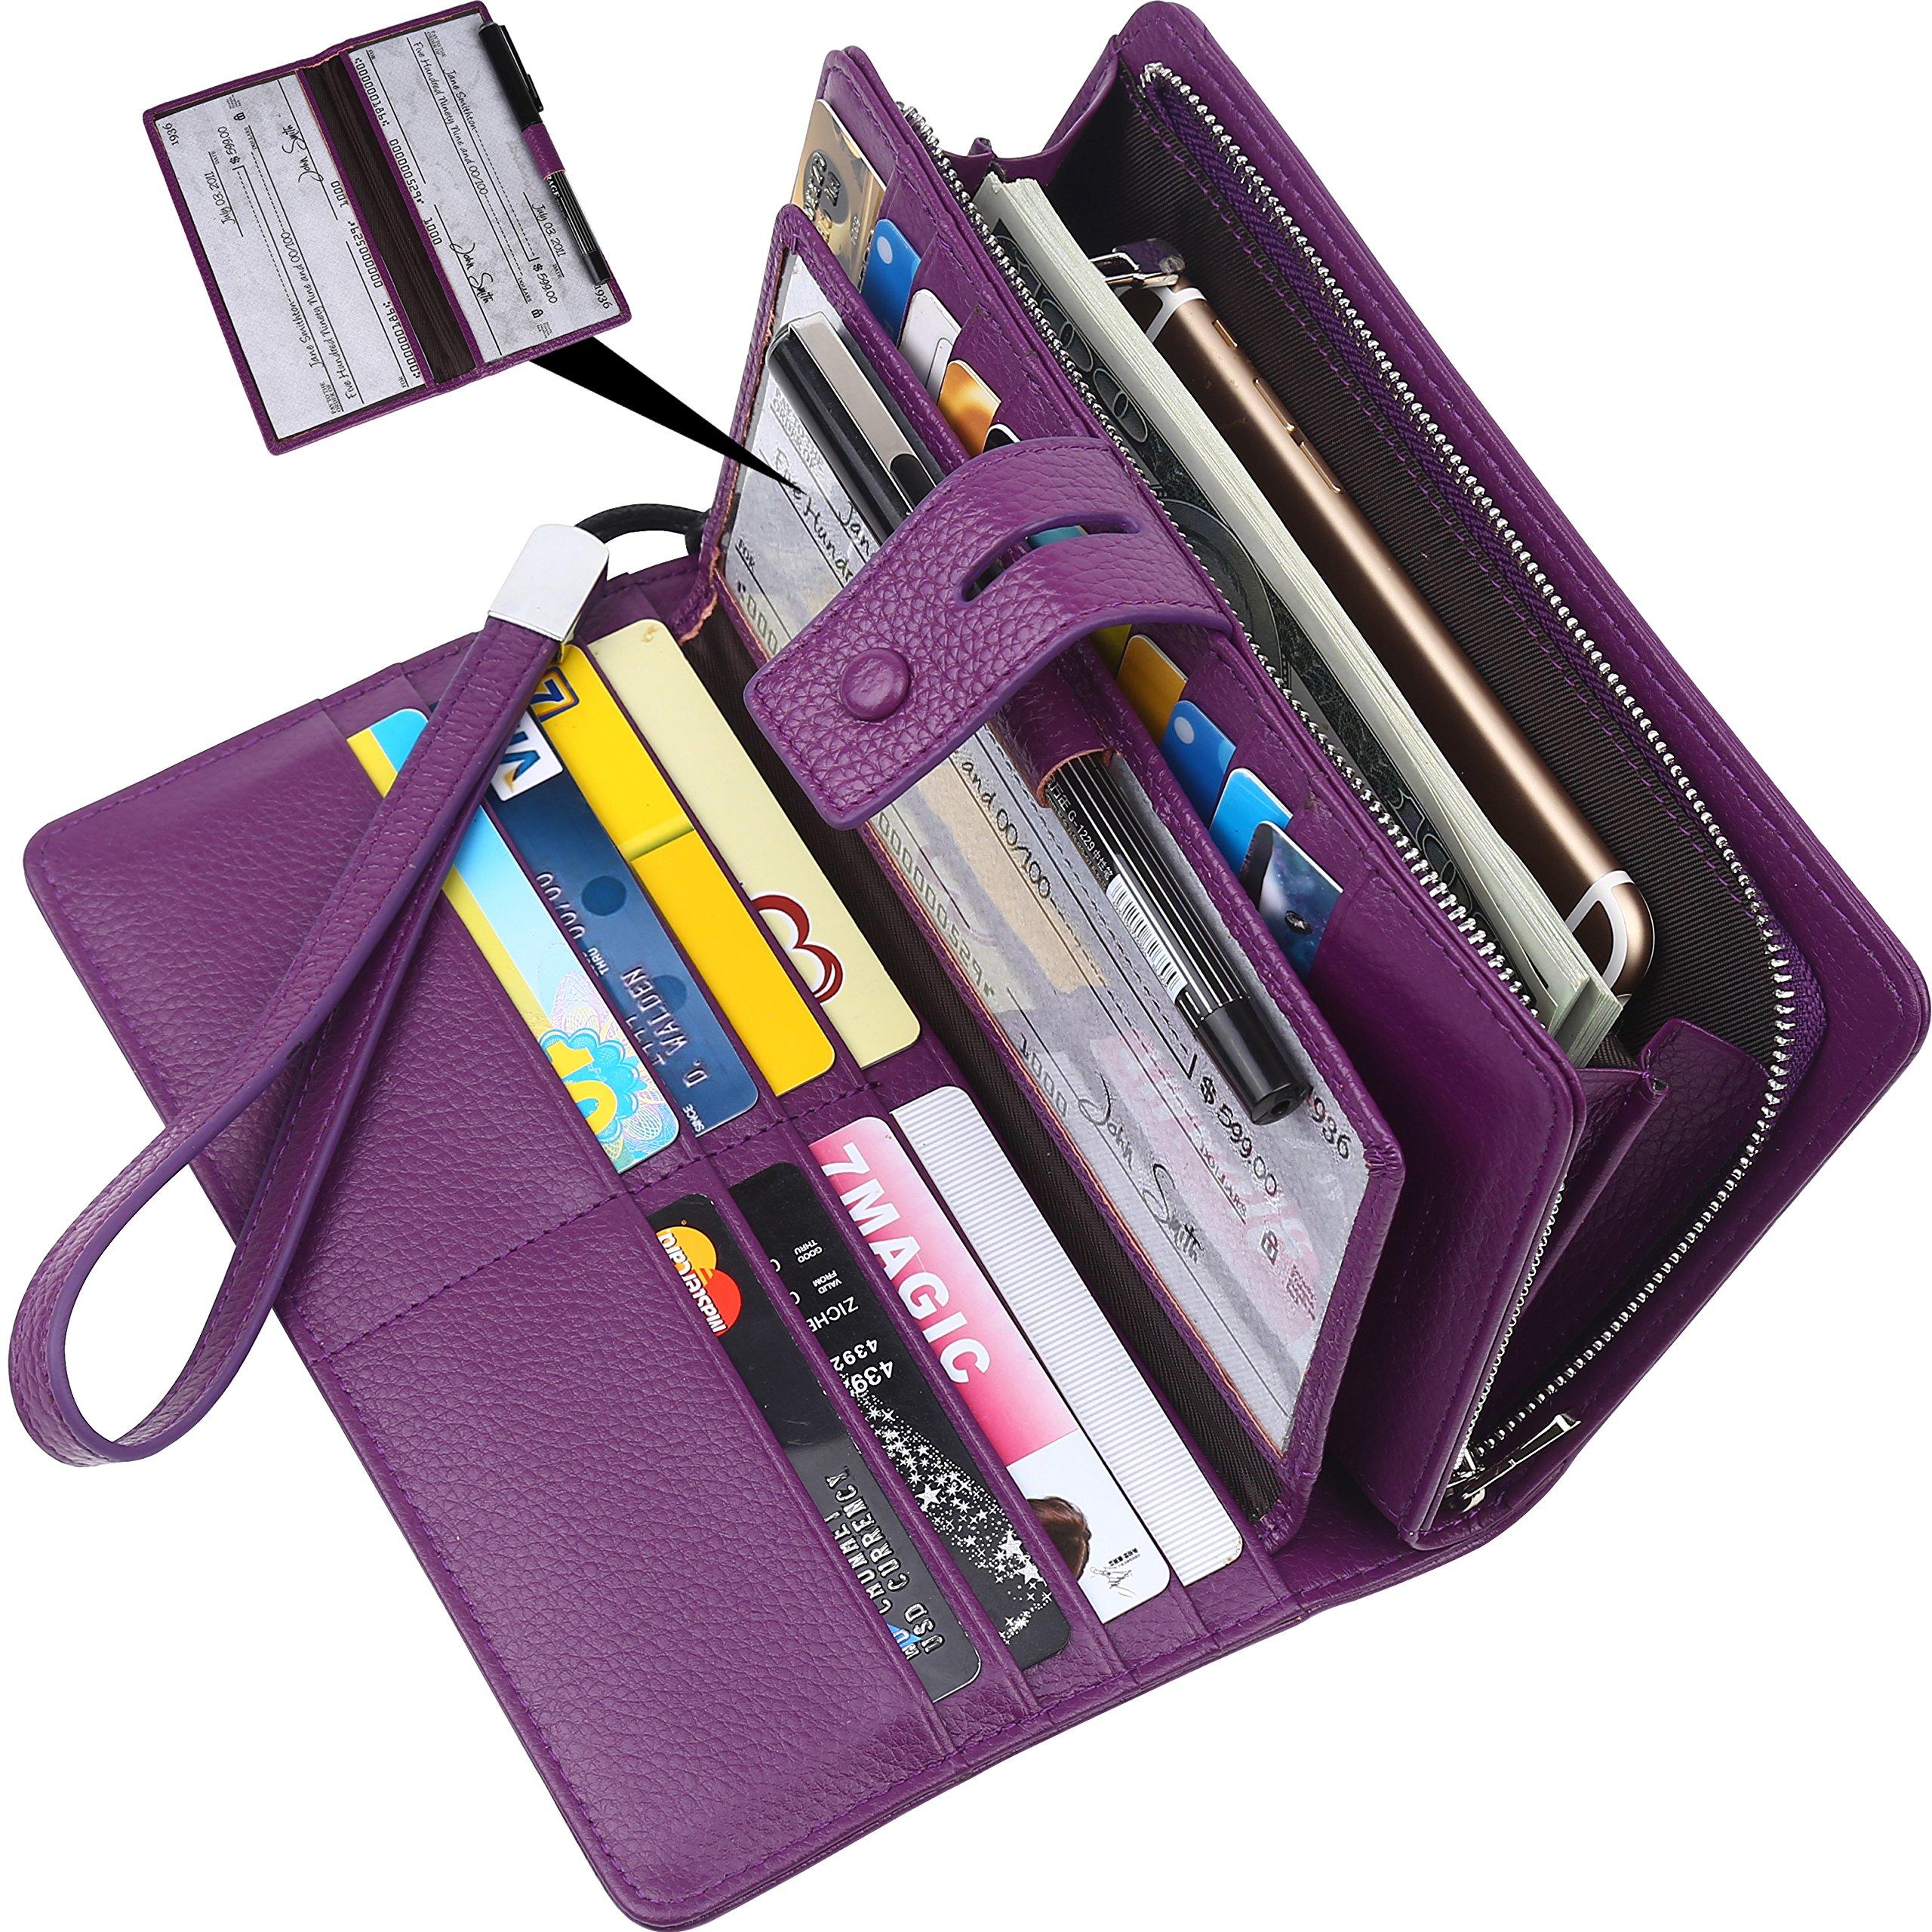 Wallet for women-RFID Blocking Real Leather checkbook wallet clutch organizer,checkbook holder(Purple)